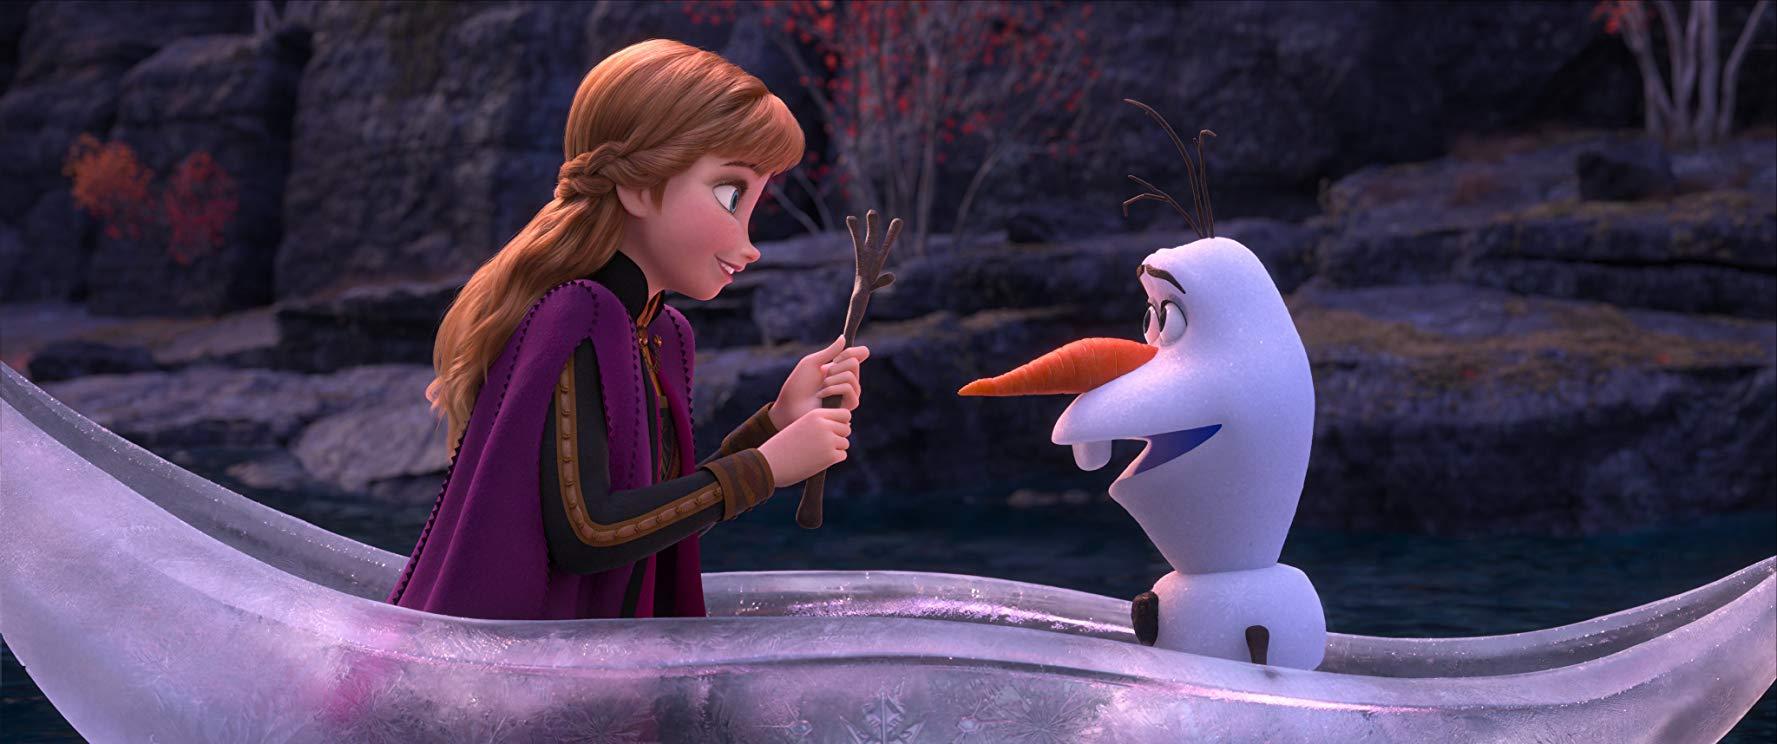 [REGARDER] La Reine des neiges 2 (2019)|HD Film VF~Complet...